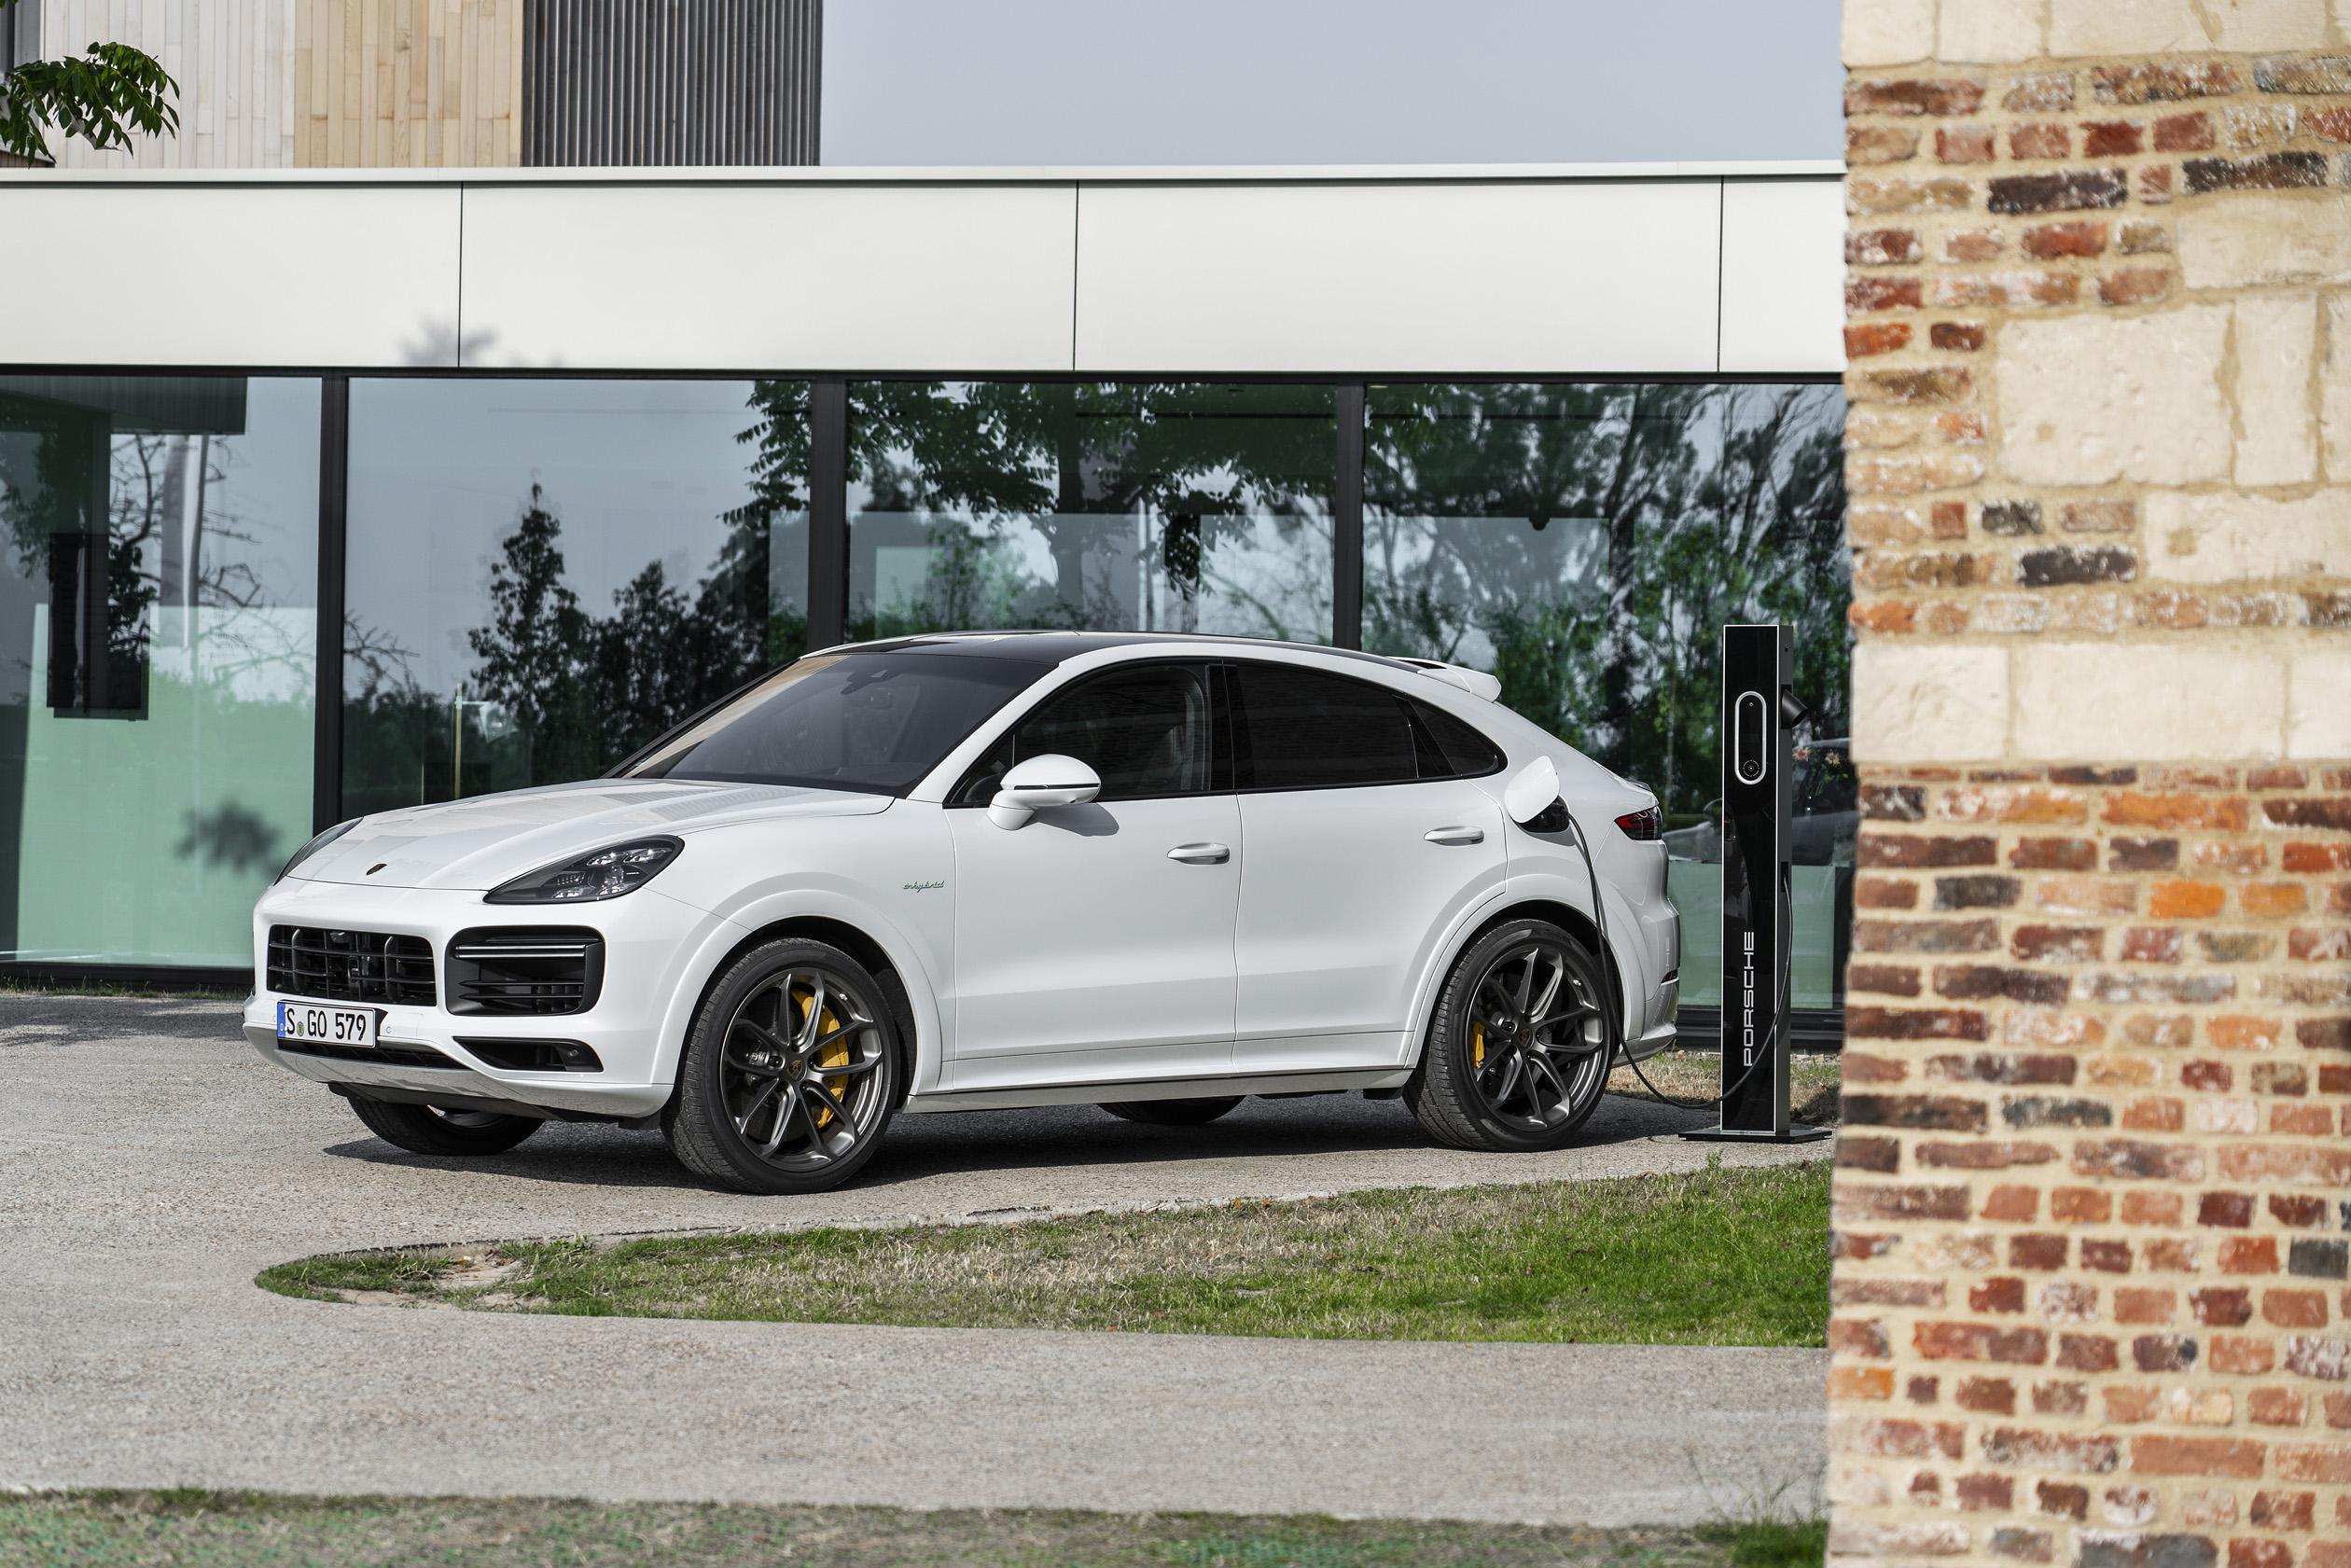 Porsche presents the 2020 Cayenne Turbo S E,Hybrid and 2020